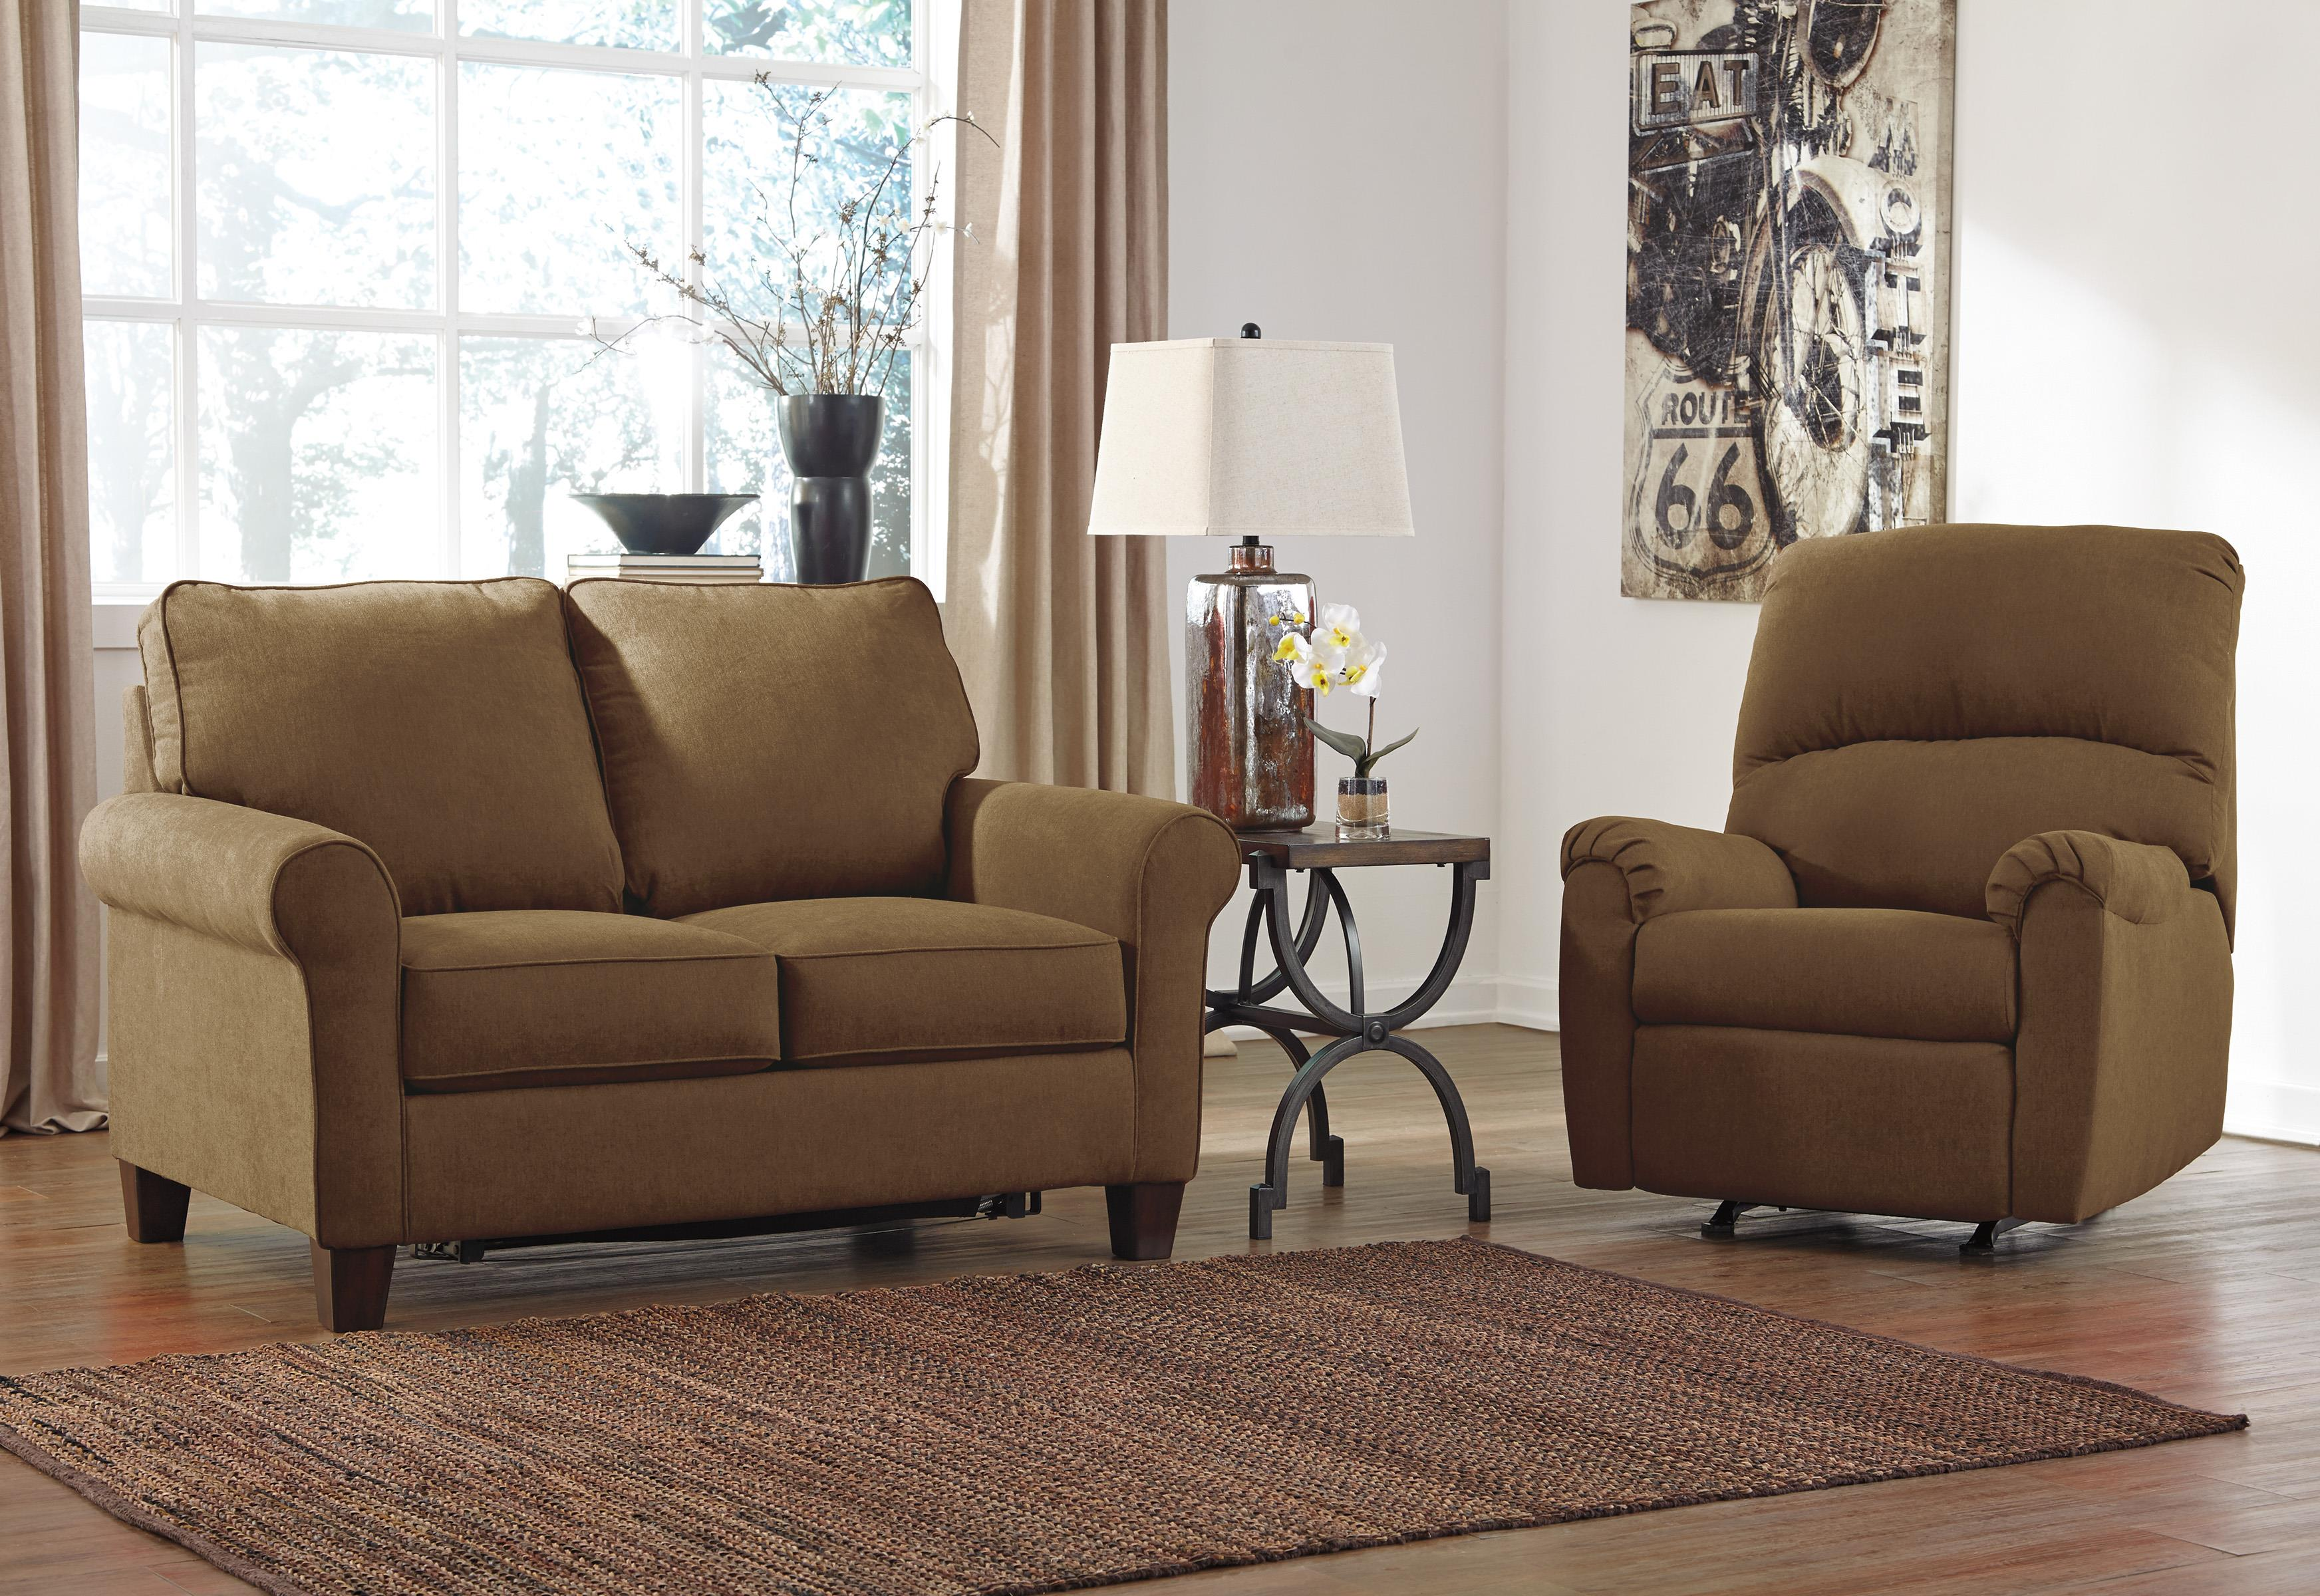 Signature Design by Ashley Zeth - Basil Stationary Living Room Group - Item Number: 27103 Living Room Group 2